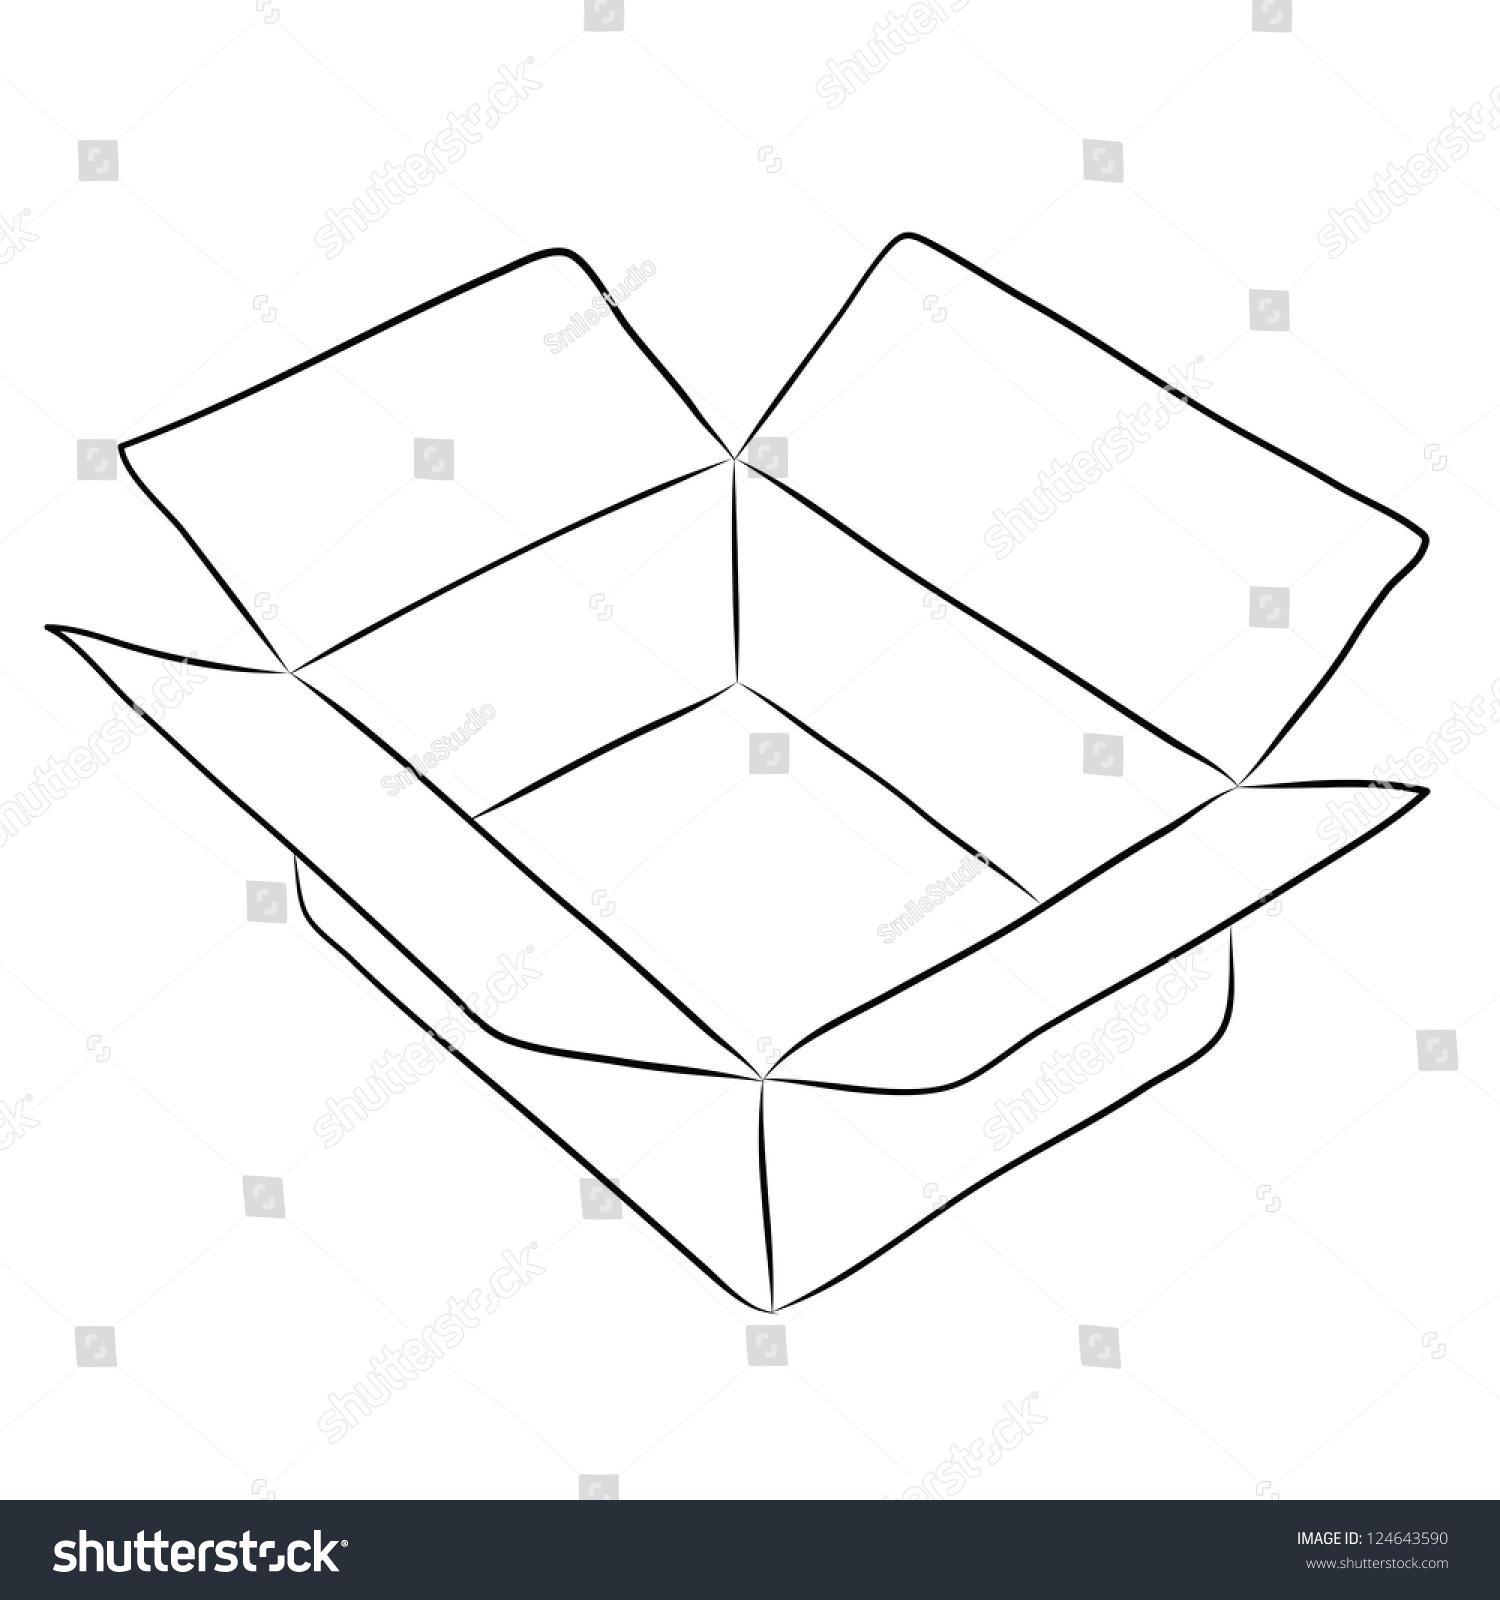 Line Art Box Design : Drawing of box stock vector illustration